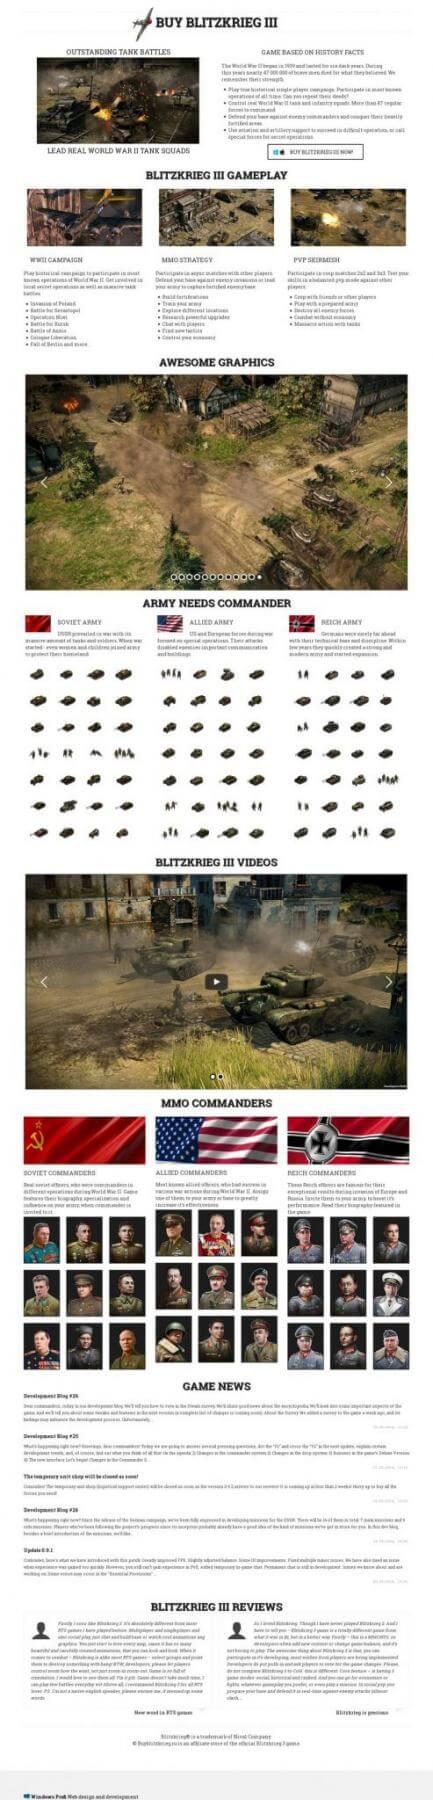 Blitzkrieg 3. Landing page